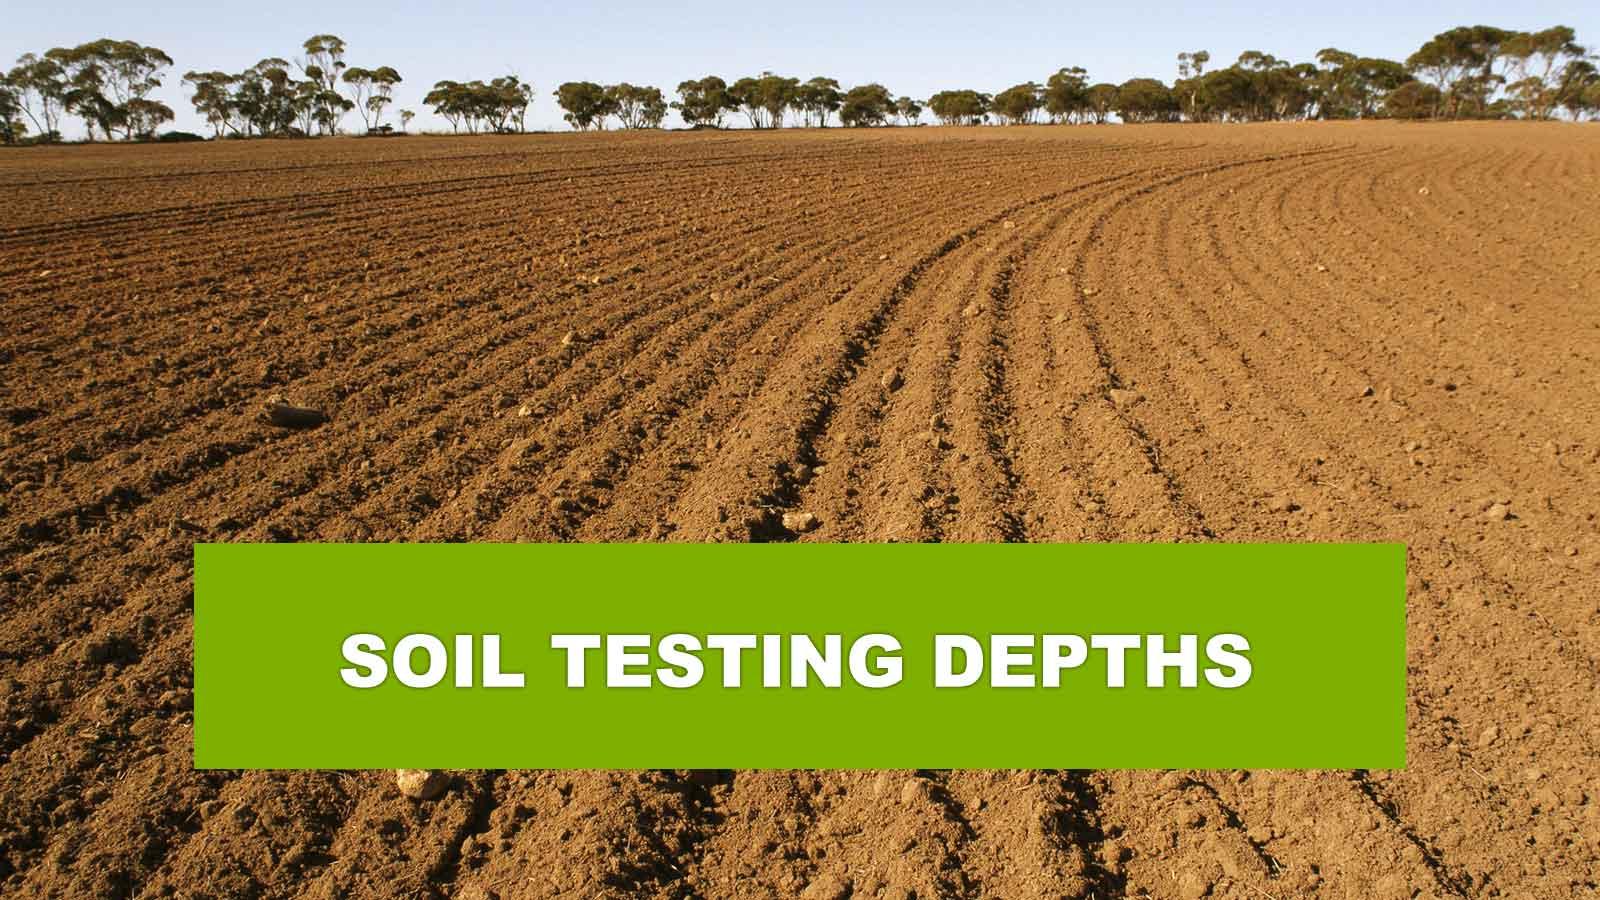 Soil testing depths